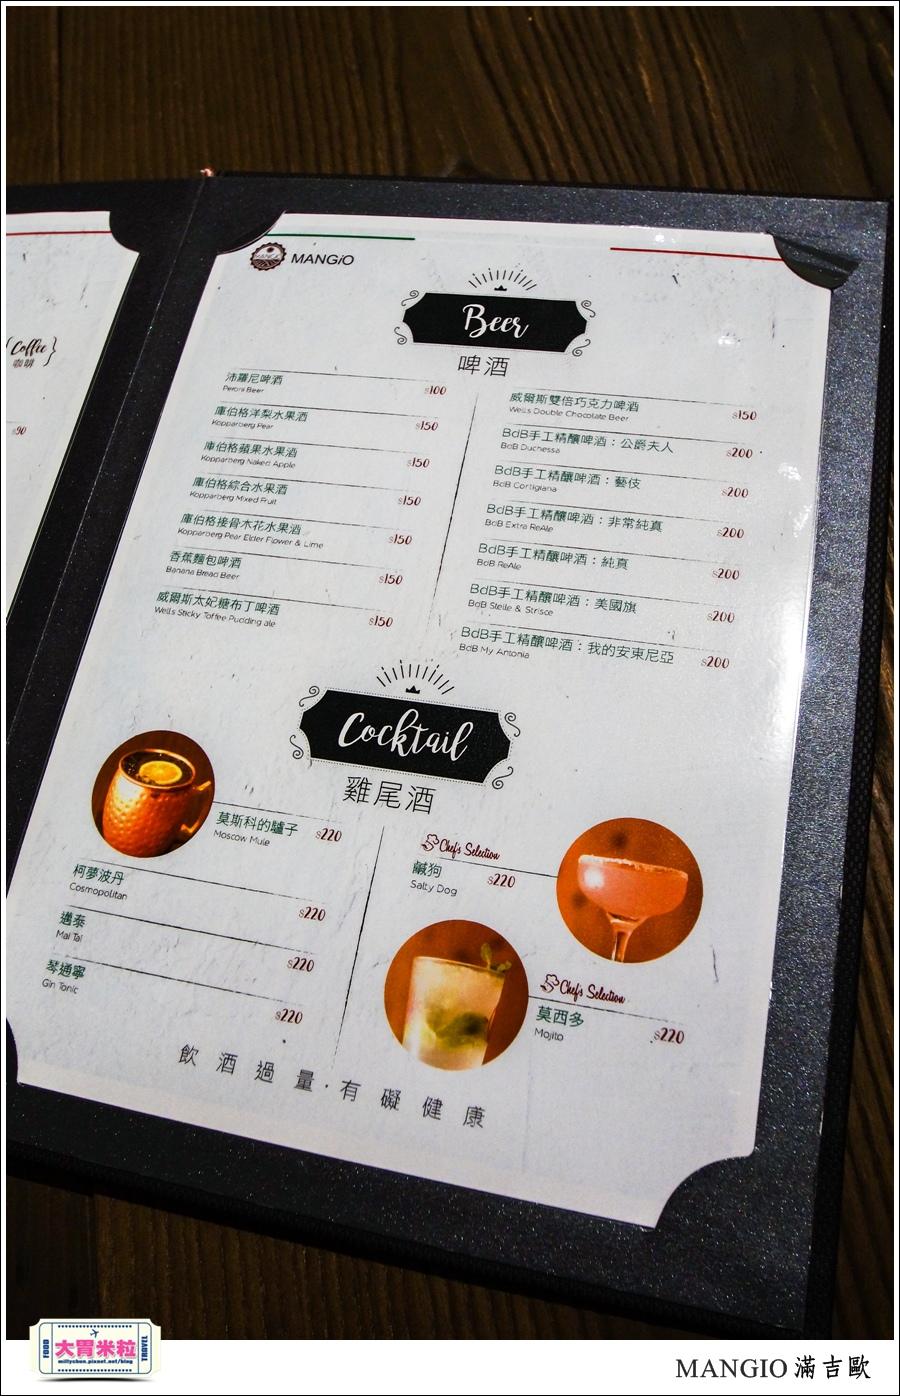 MANGiO Bistro 滿吉歐義式樂活餐酒館@台北餐酒館推薦@大胃米粒0066.jpg